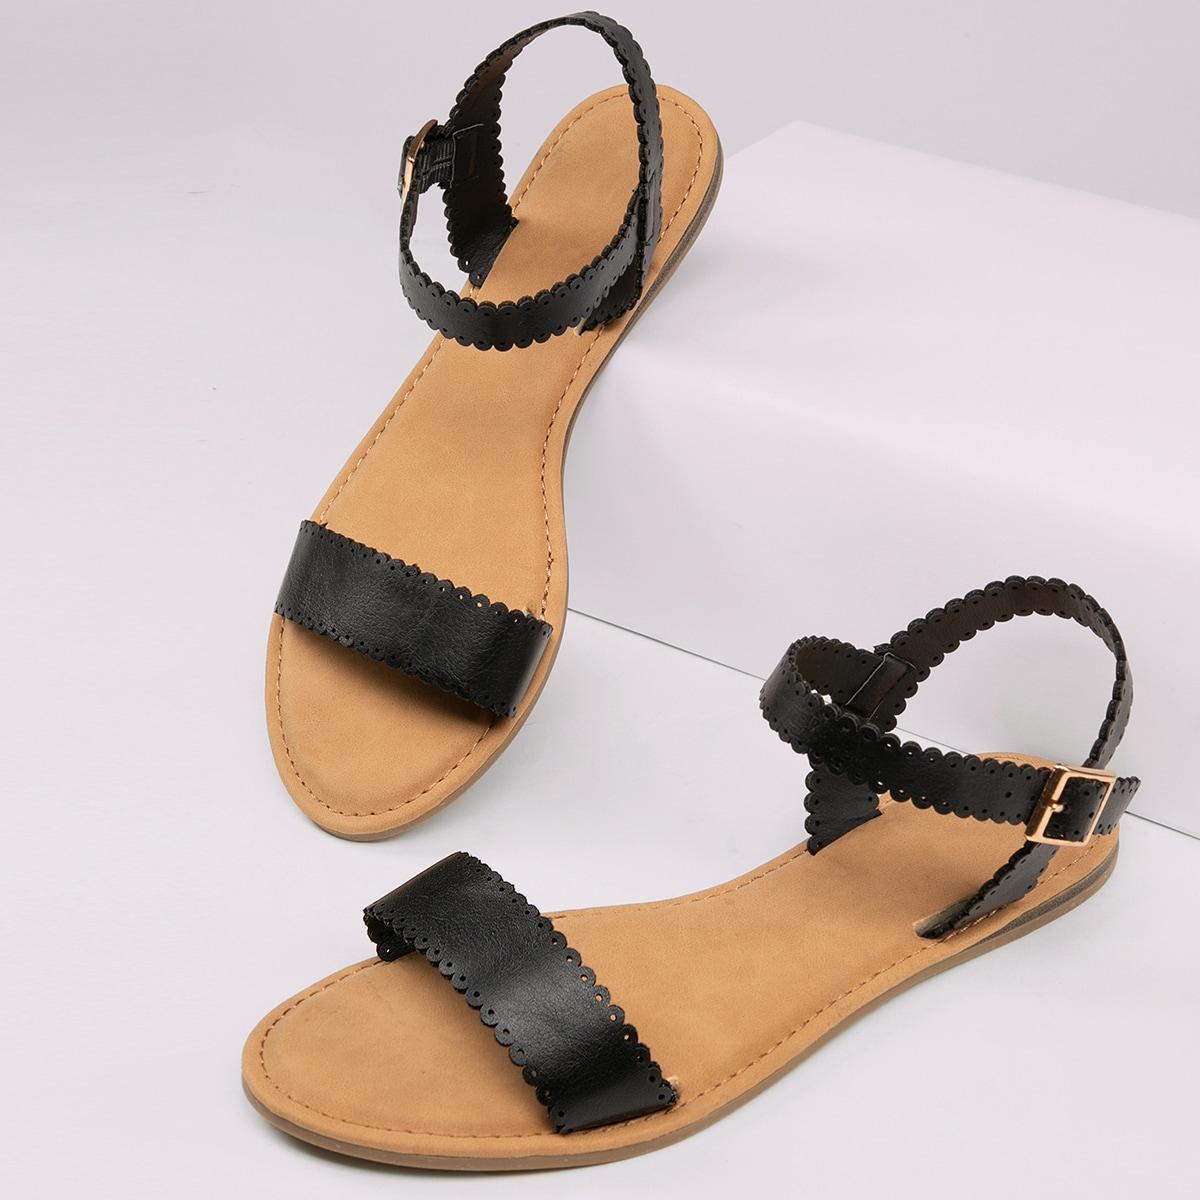 SHEIN / Scallop Trim Open Toe Sandals BLACK